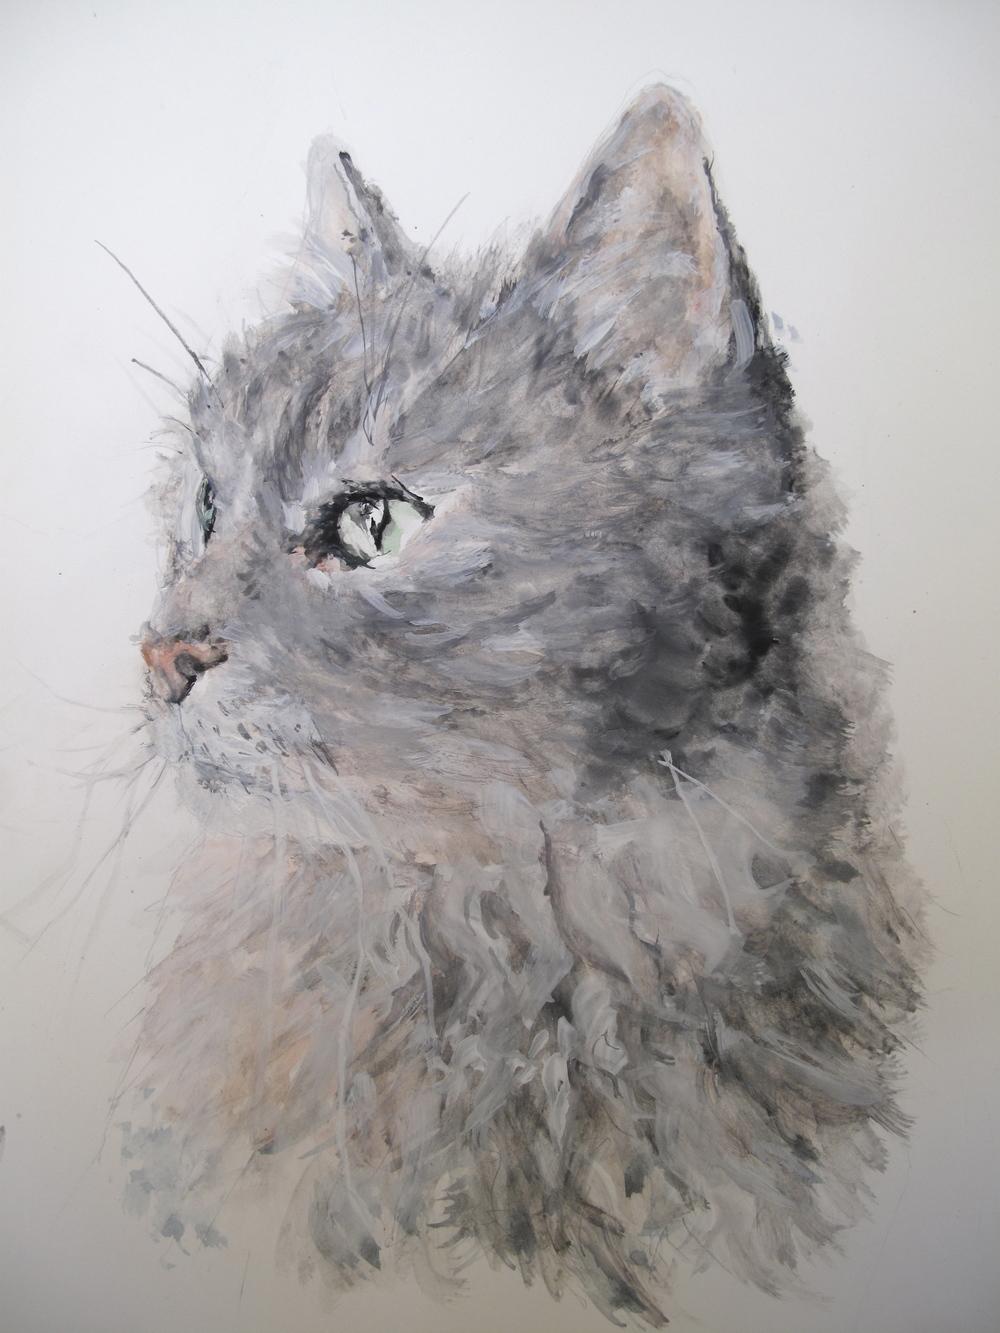 Miro the cat - a painted portrait